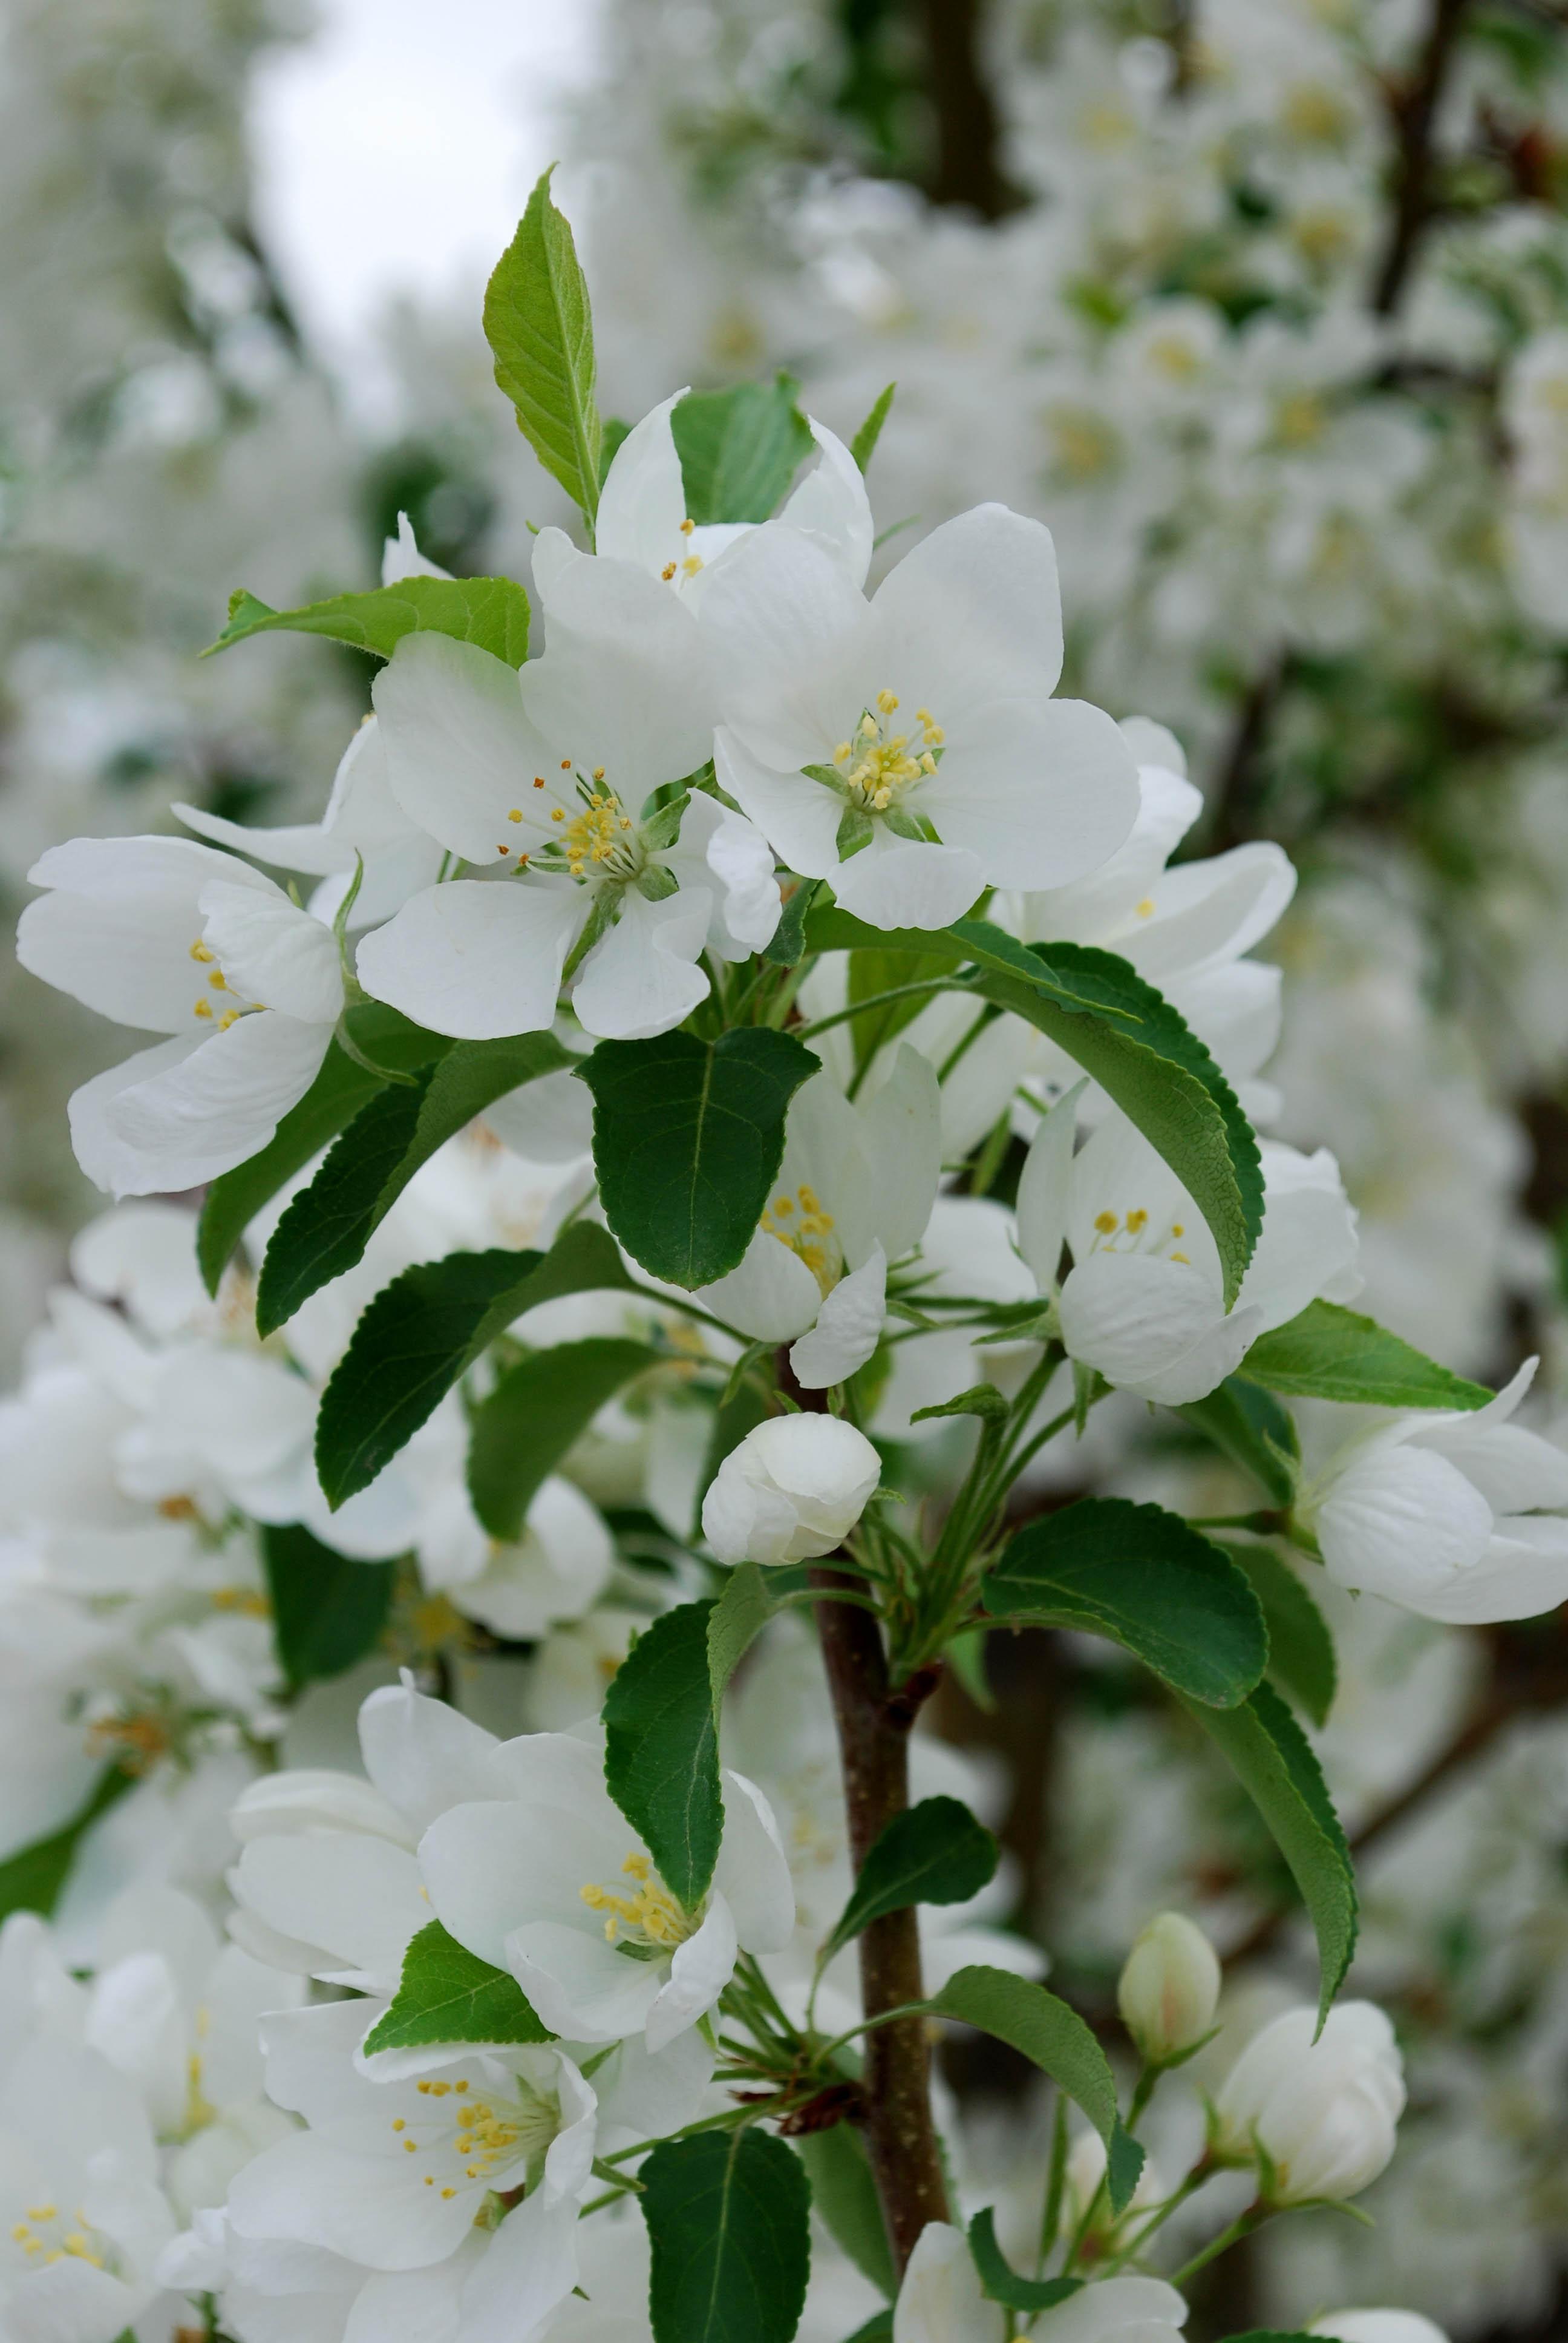 Spring Snow Crabapple Flower Close Up